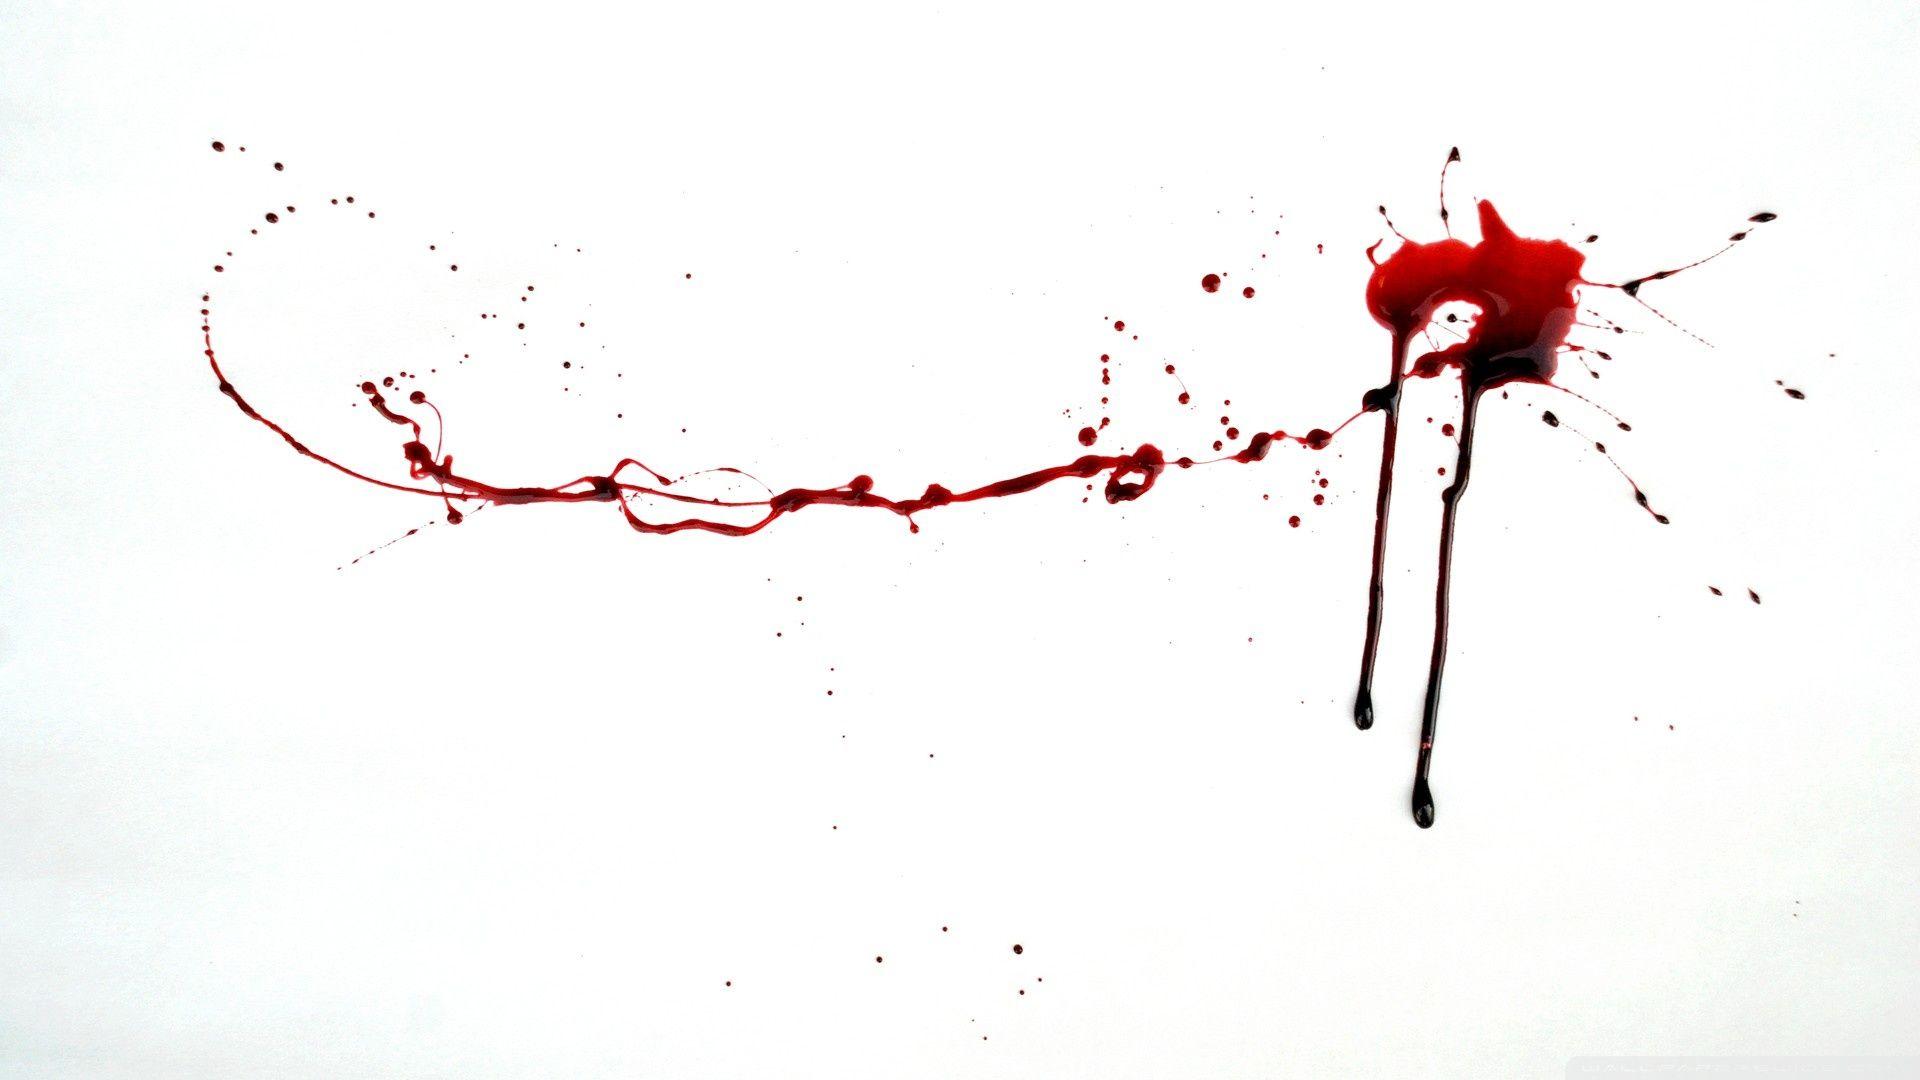 Best Wallpaper Design – Bloody wallpaper